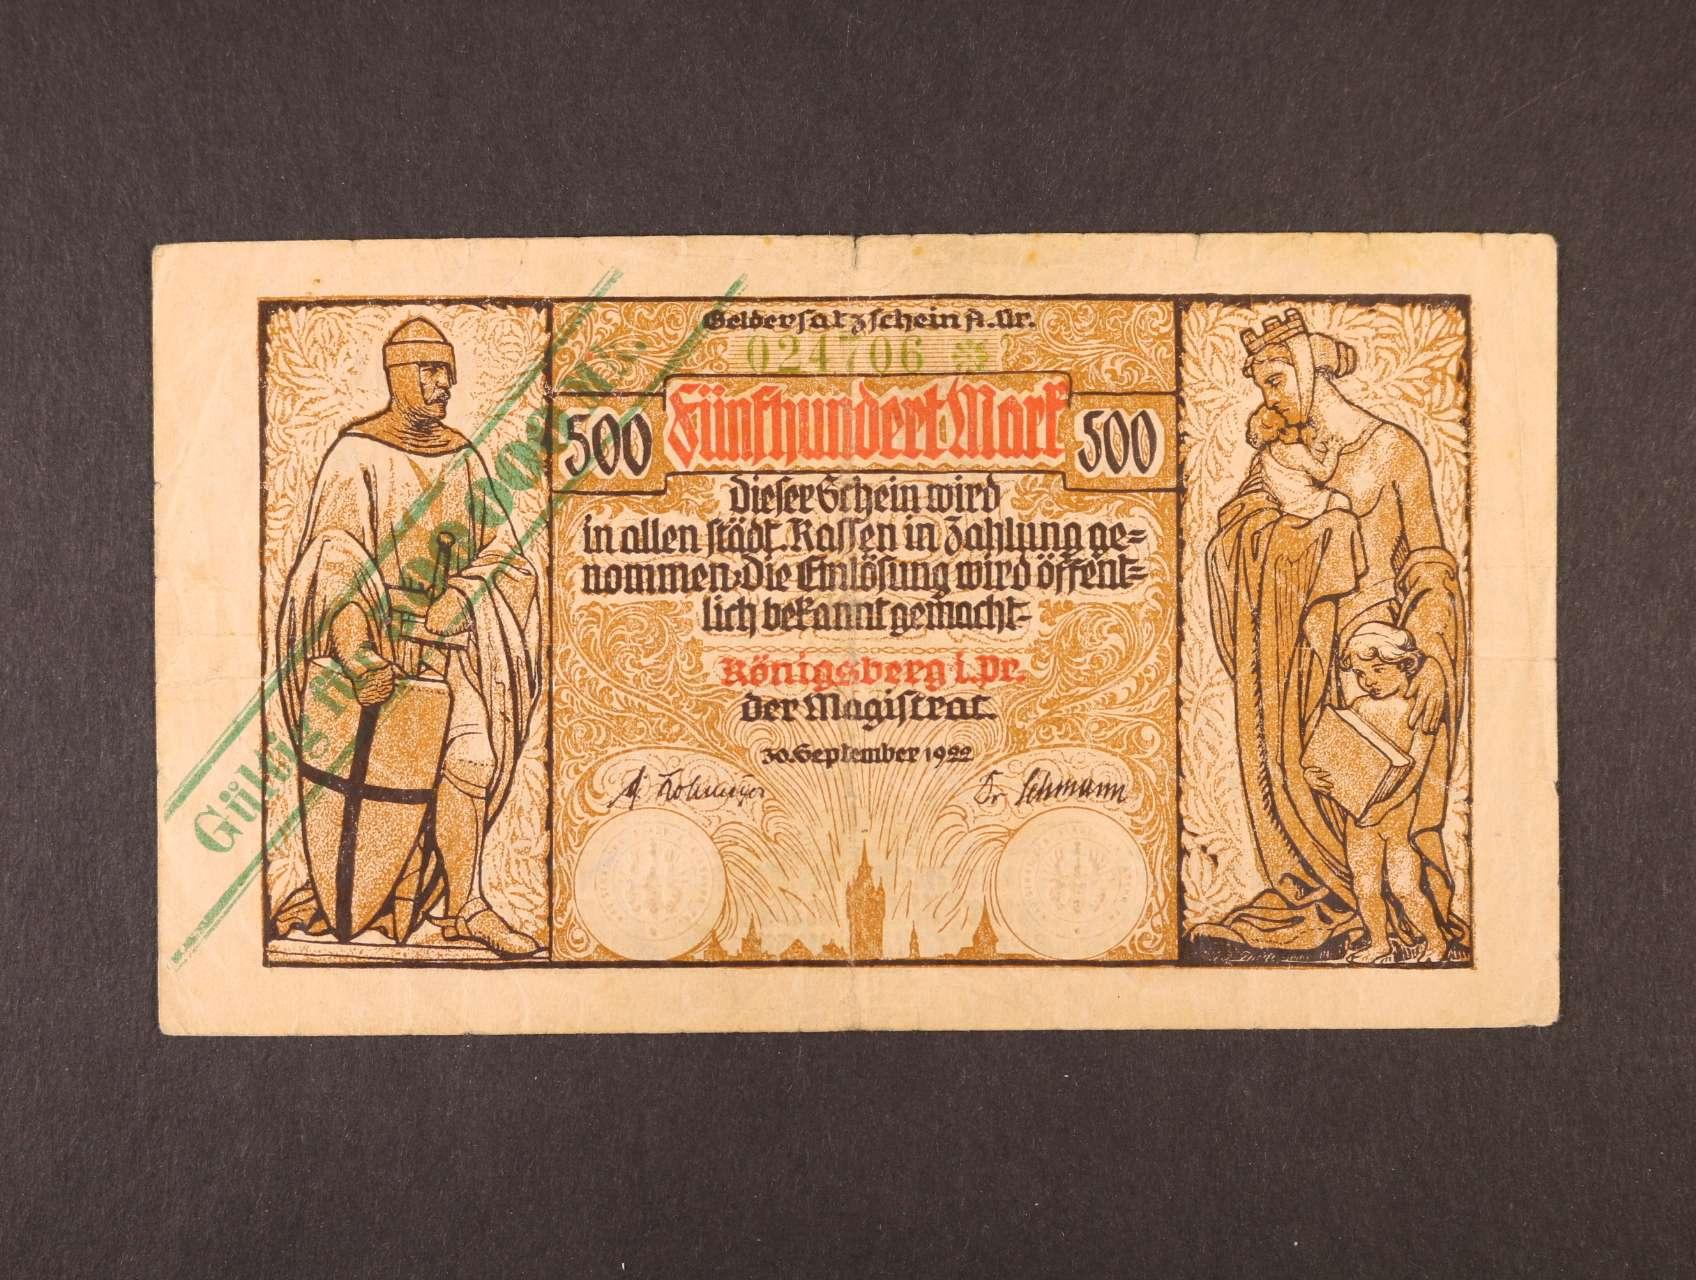 Königsberg, 500.000 Mark 1922 City Gouvernment, Rj. R-13046